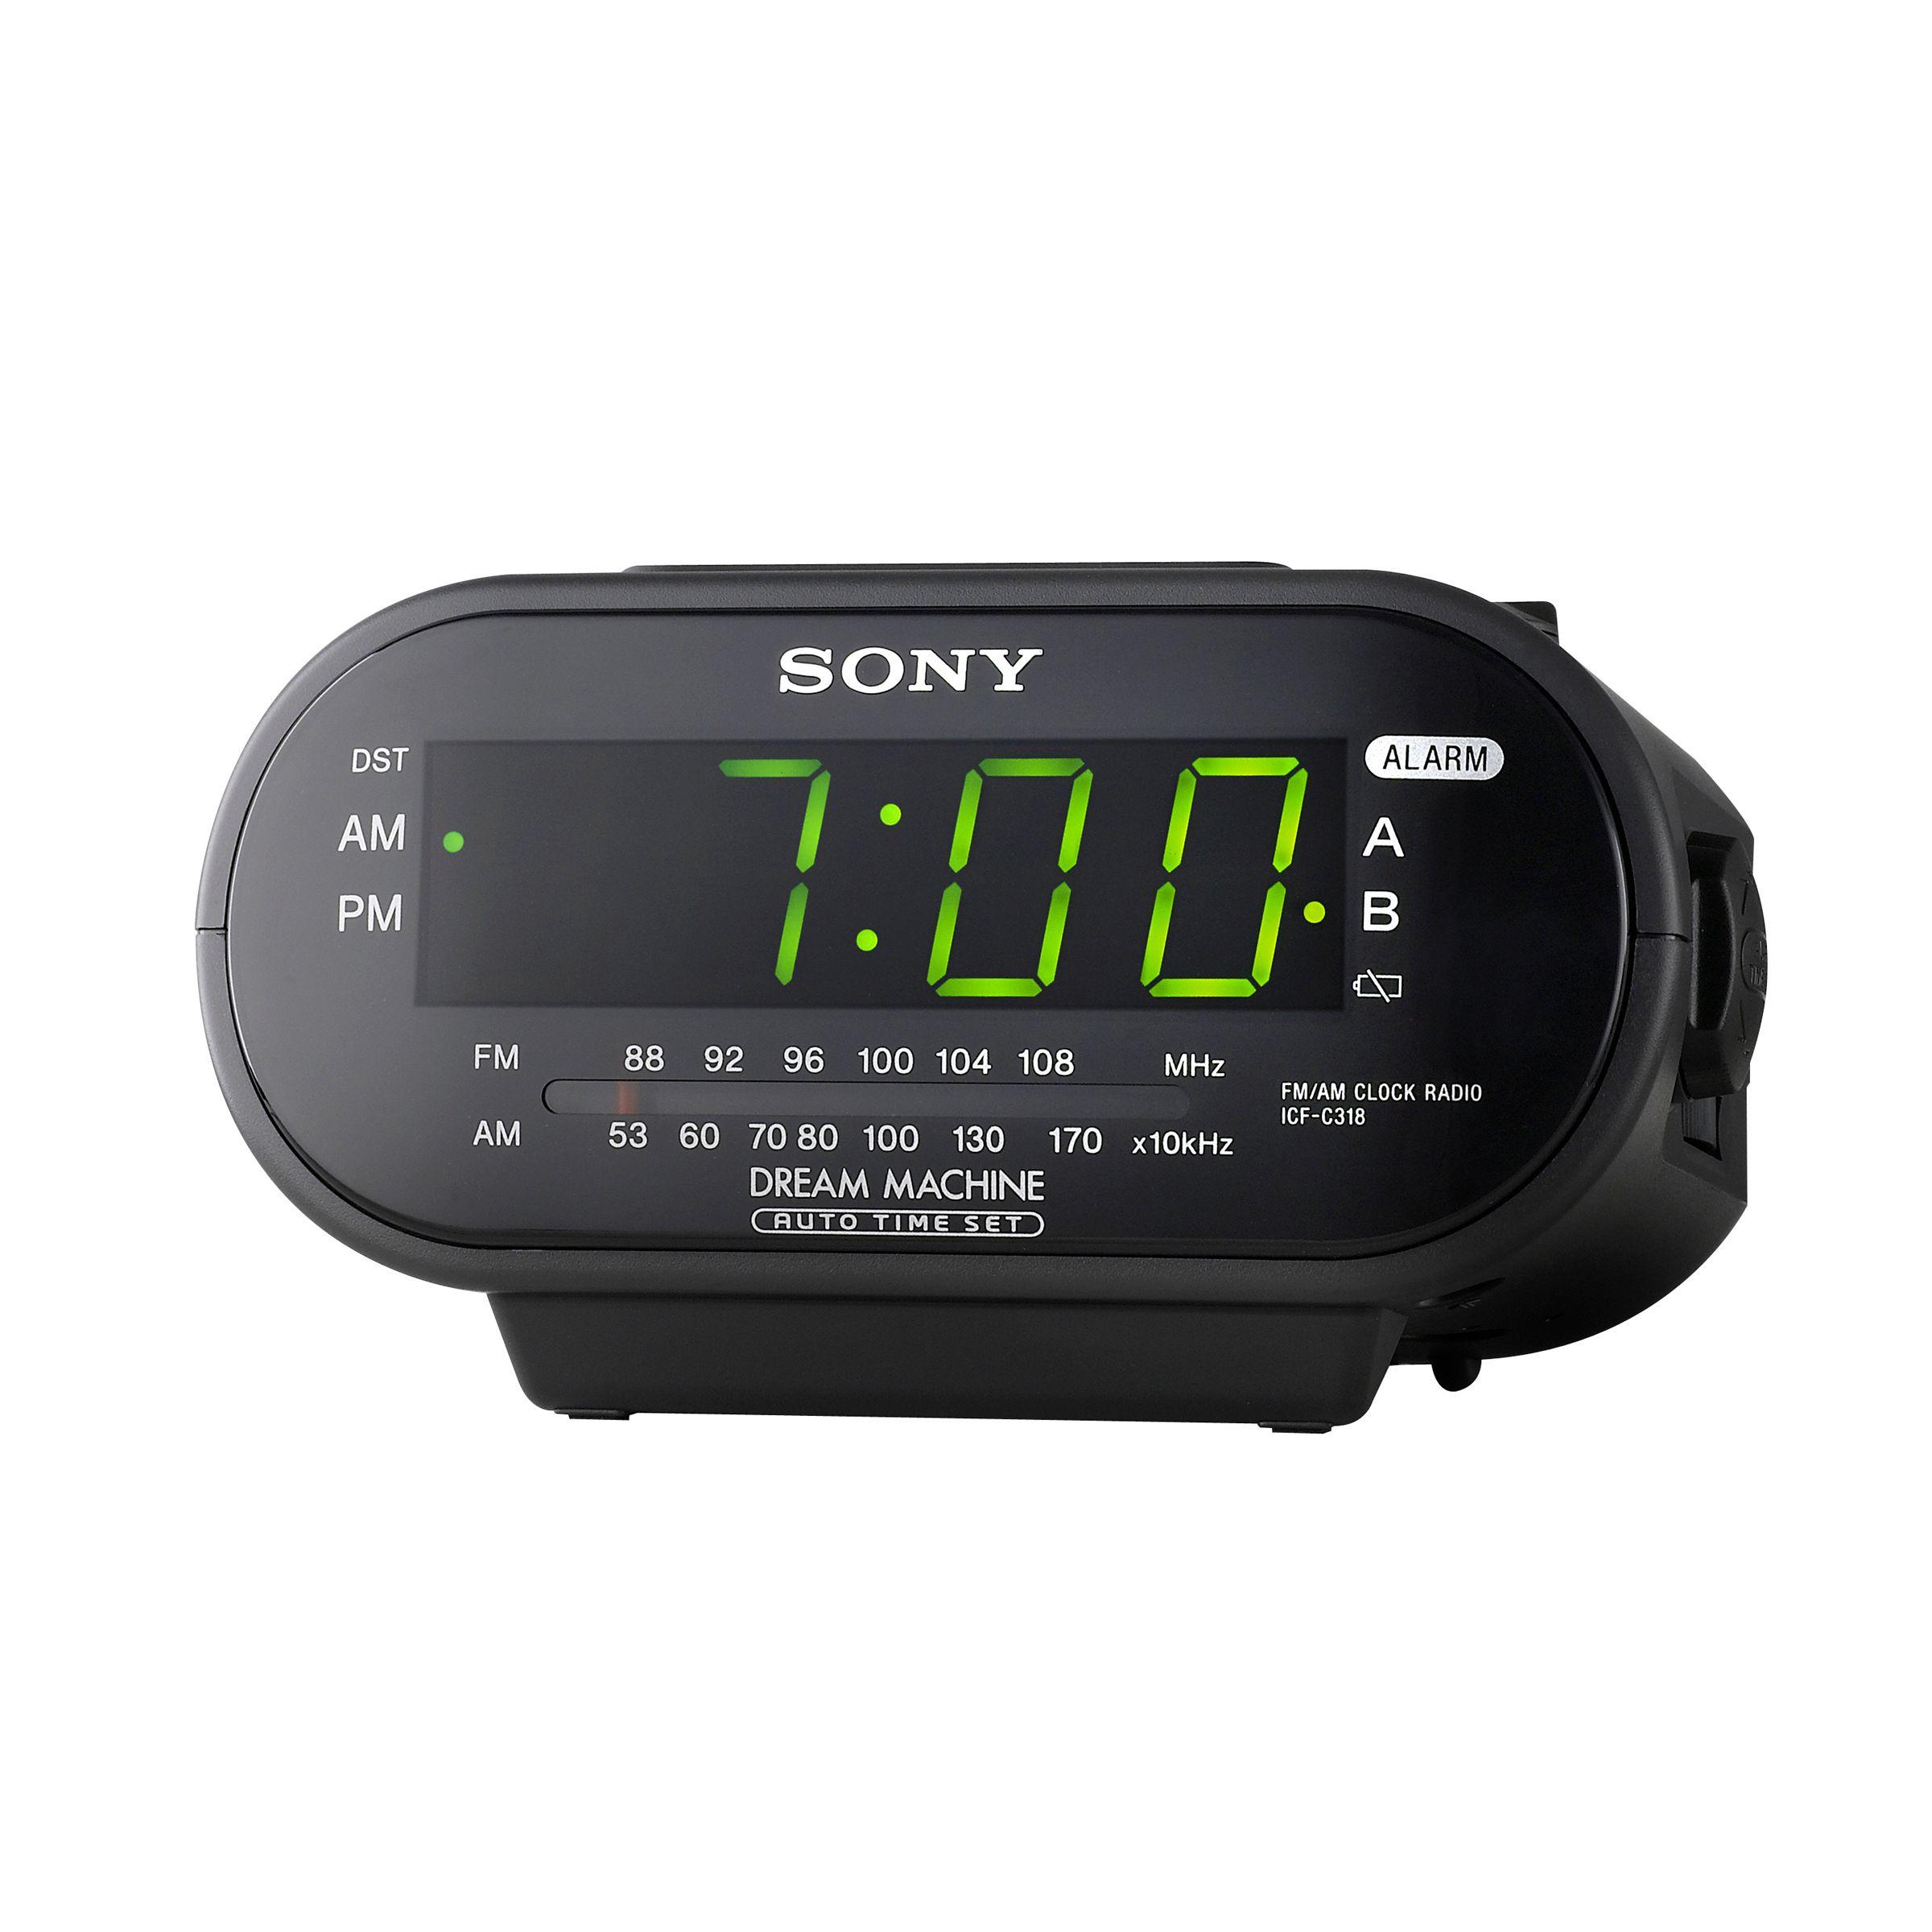 Sony Dream Machine Clock Radio, FM/AM, Black, 1 radio